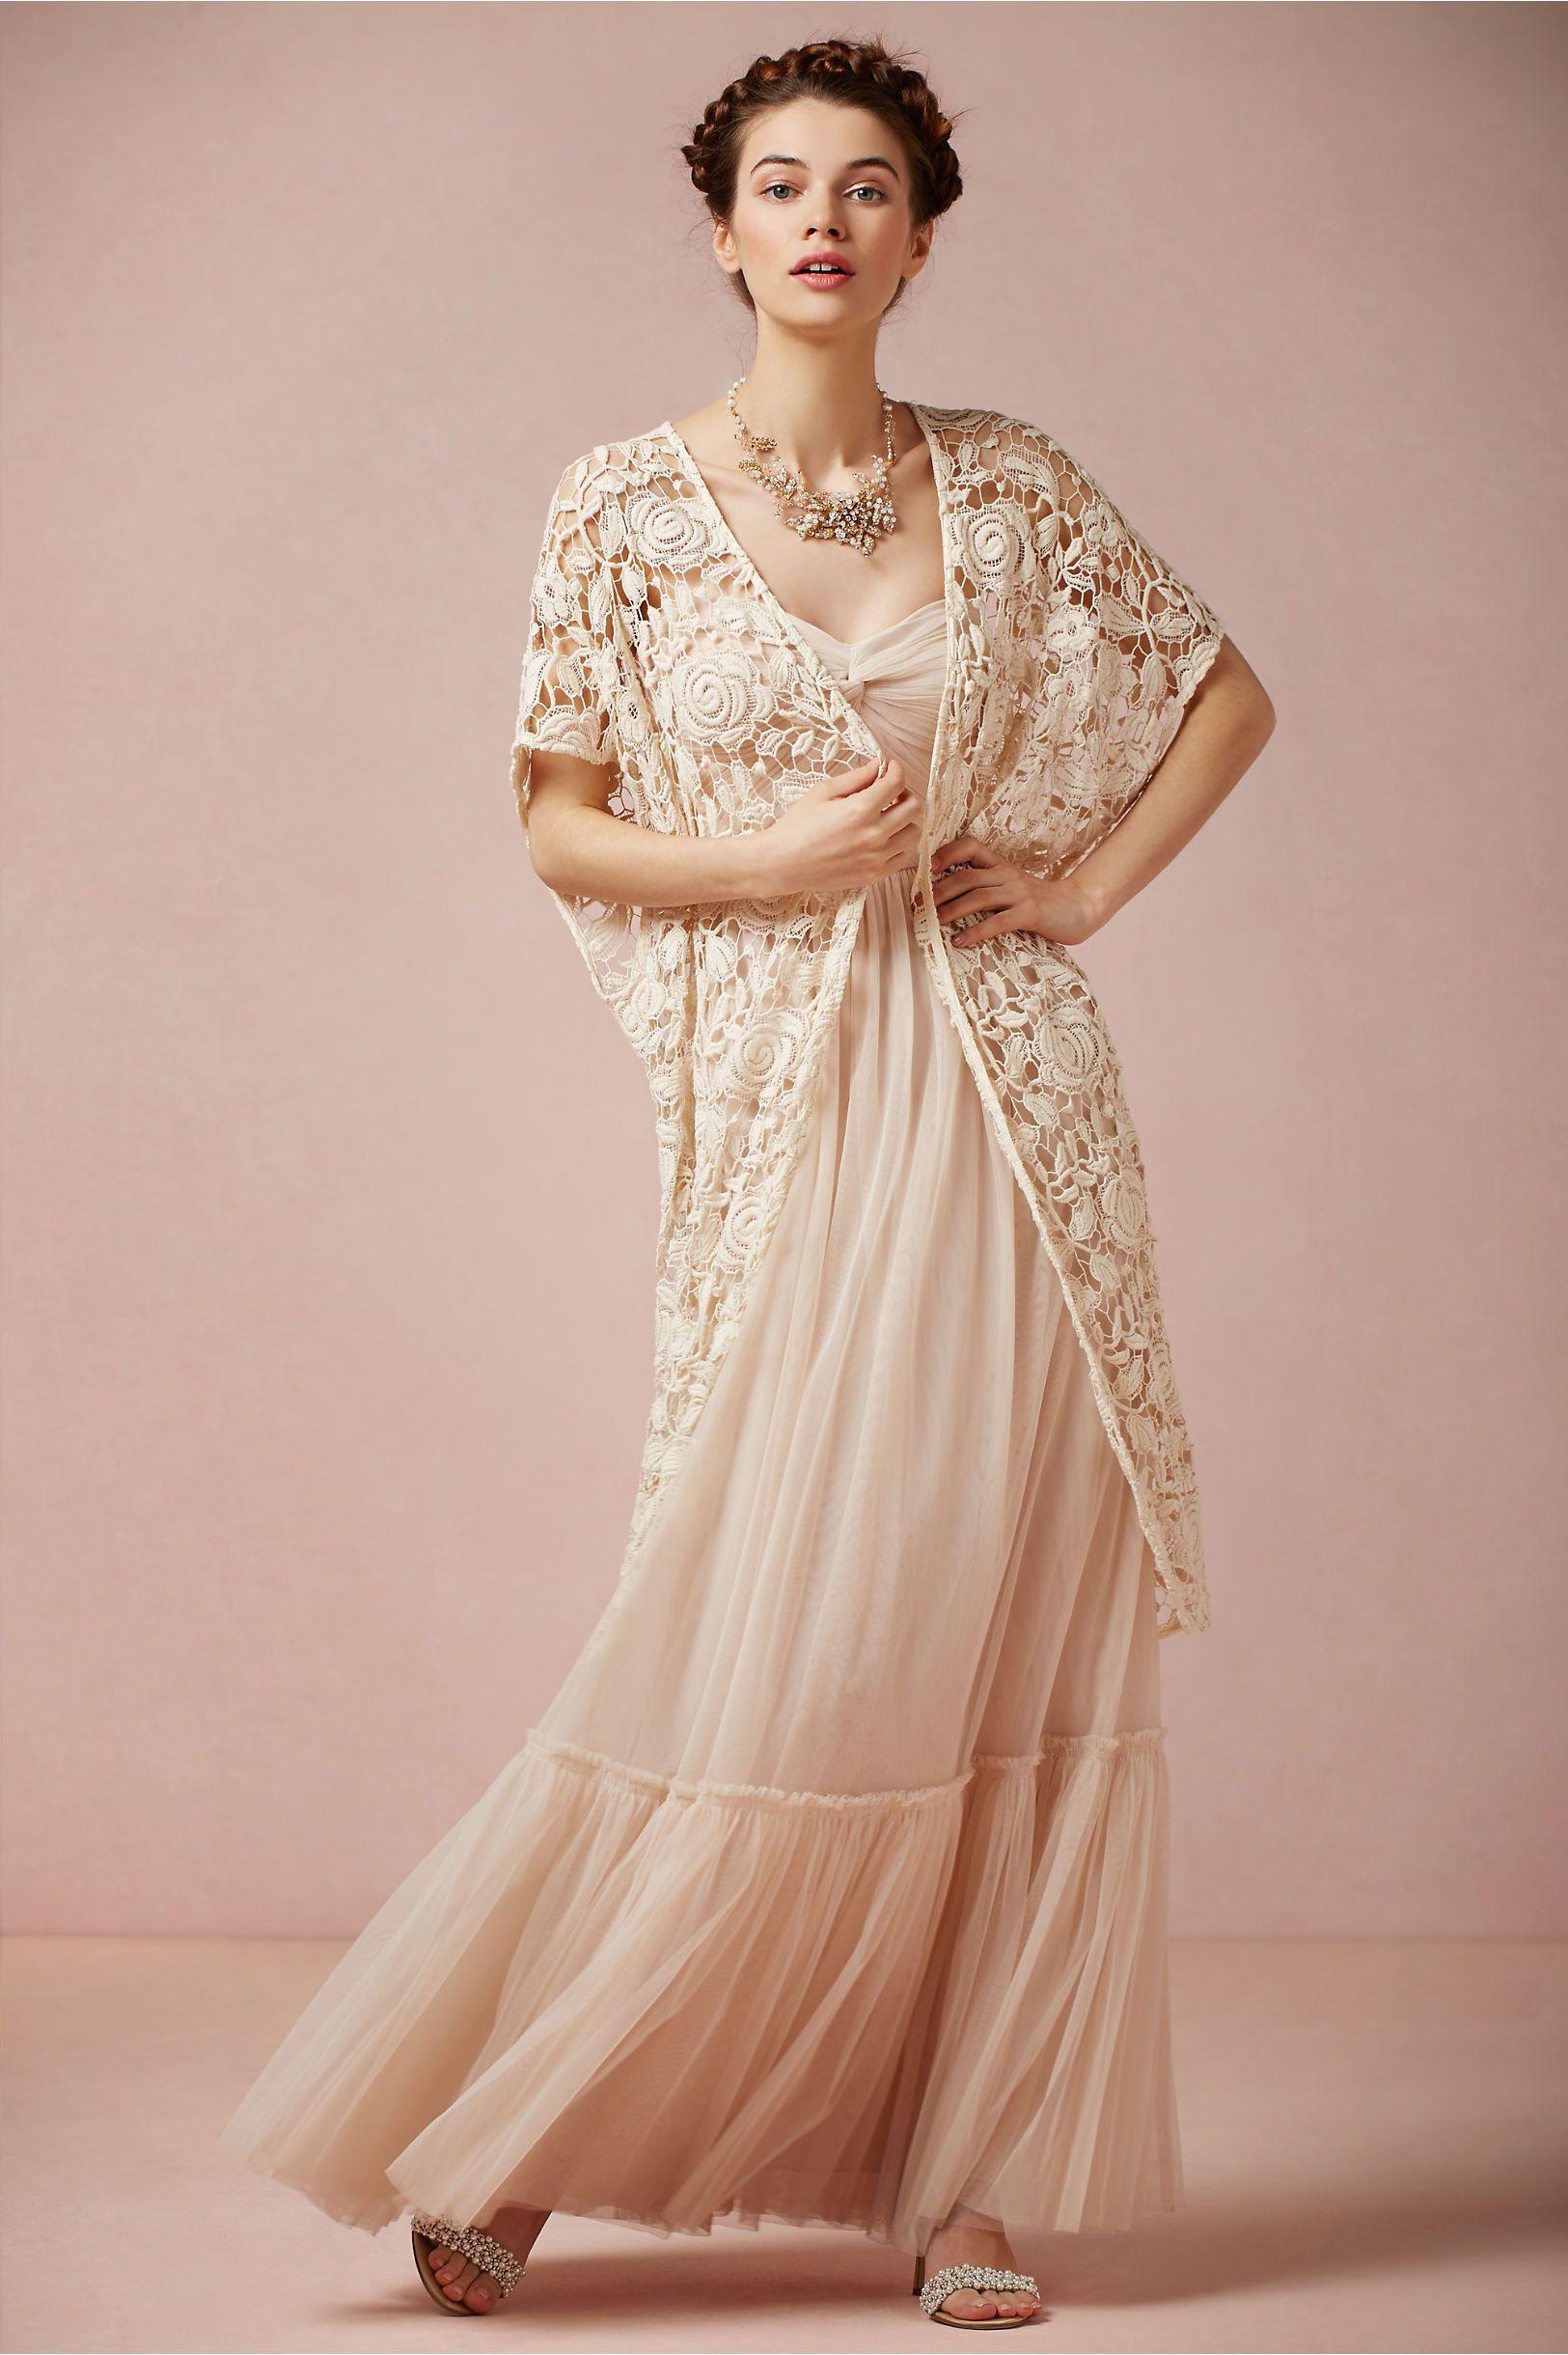 Rose Garden Cape in Bride Bridal Cover Ups at BHLDN